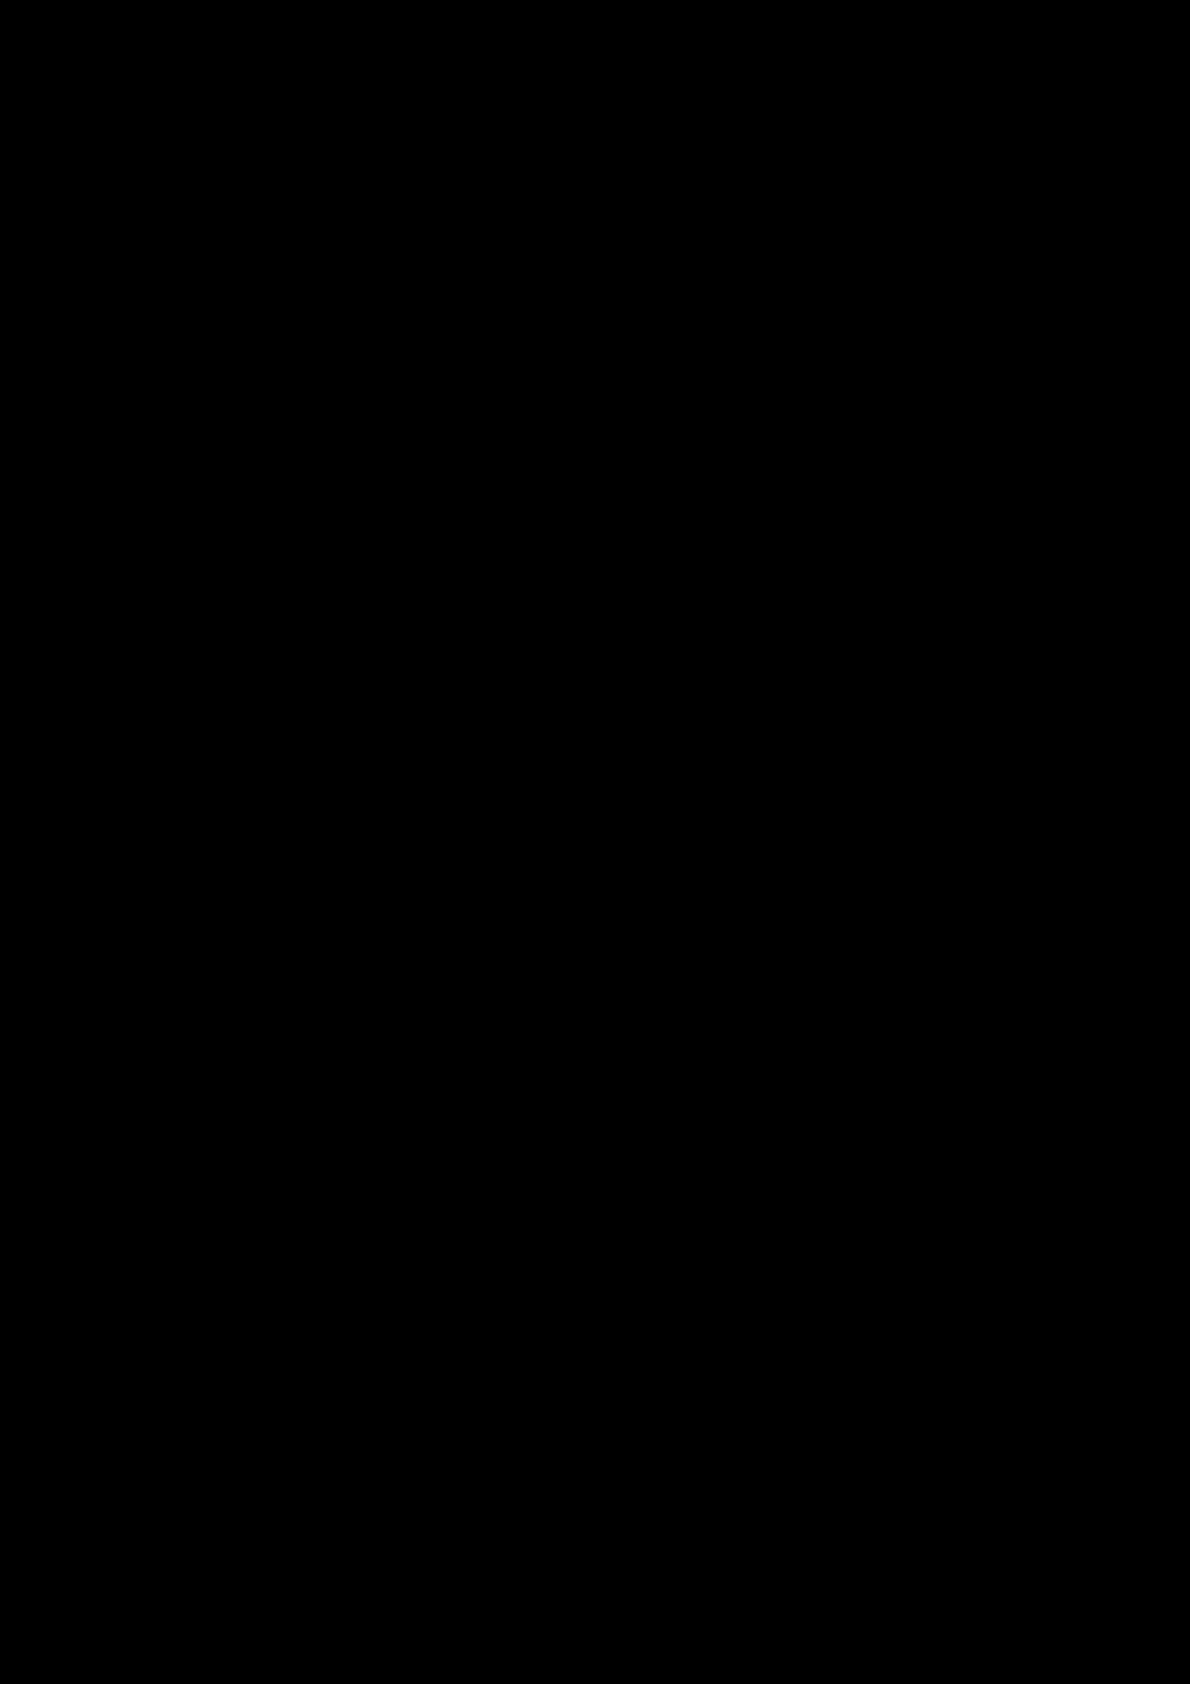 Autopia-presenta/specimen-autopia-b-regular.png